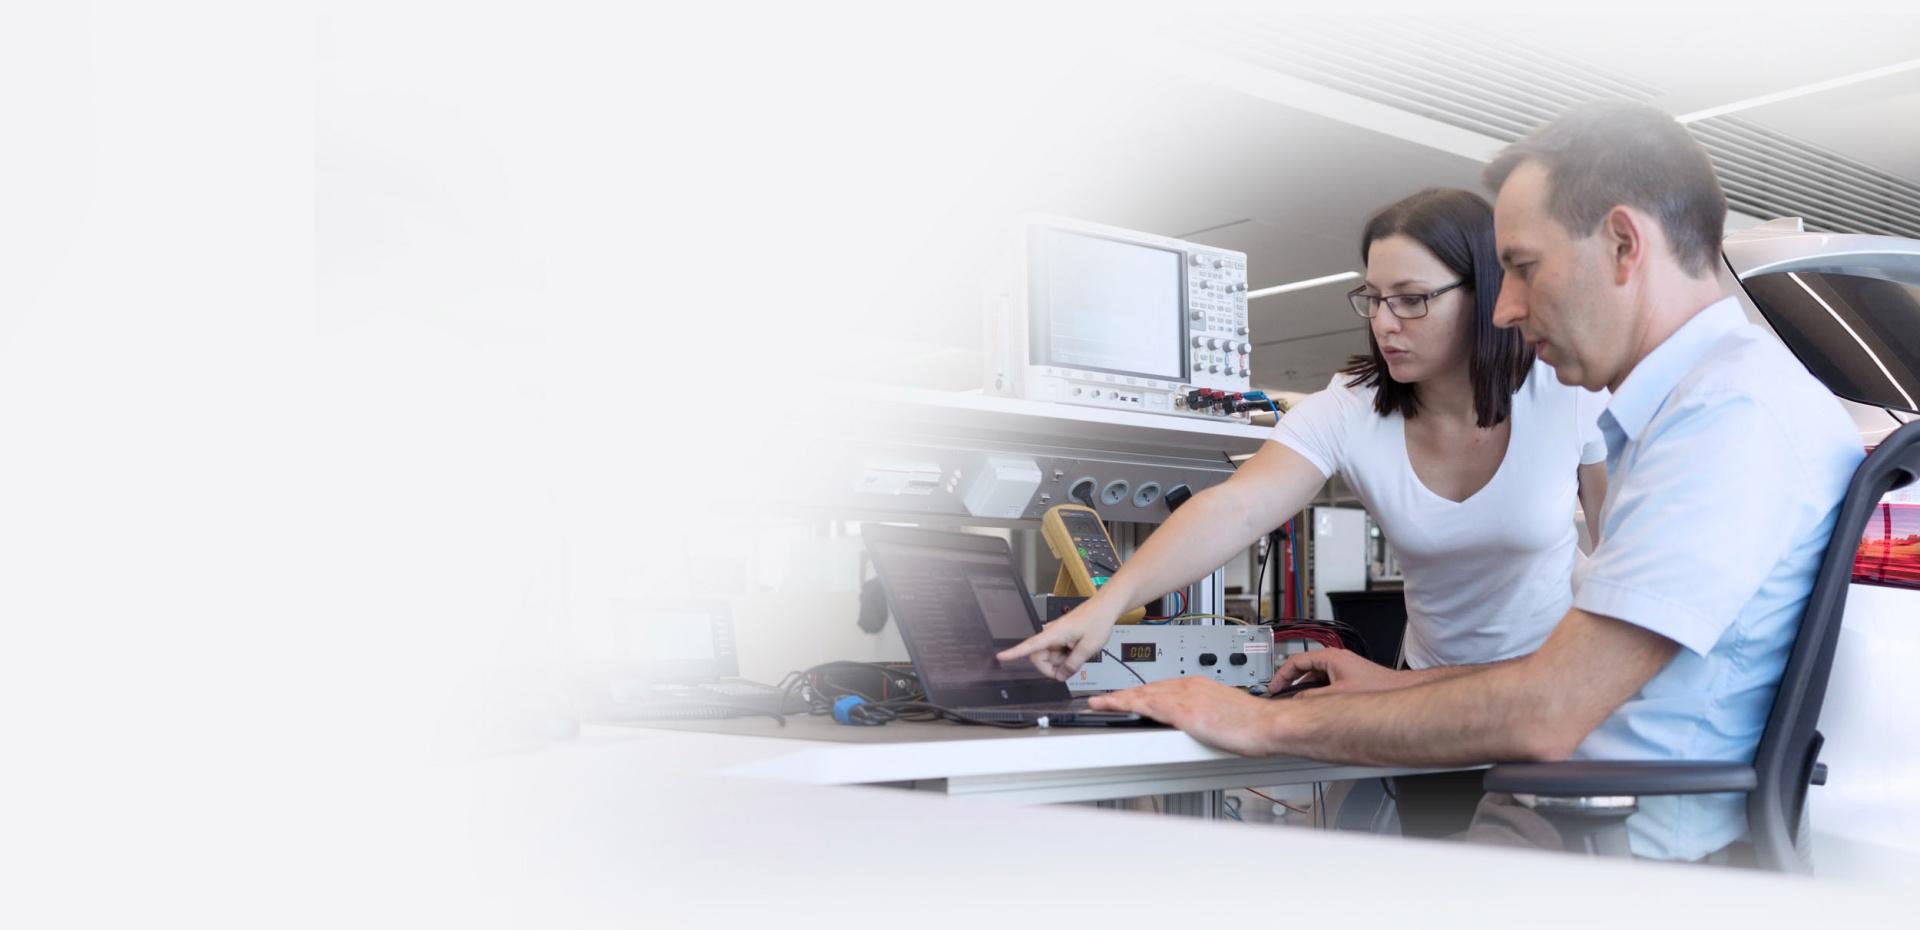 Flexibles Brose Bürokonzept für kreatives Arbeiten